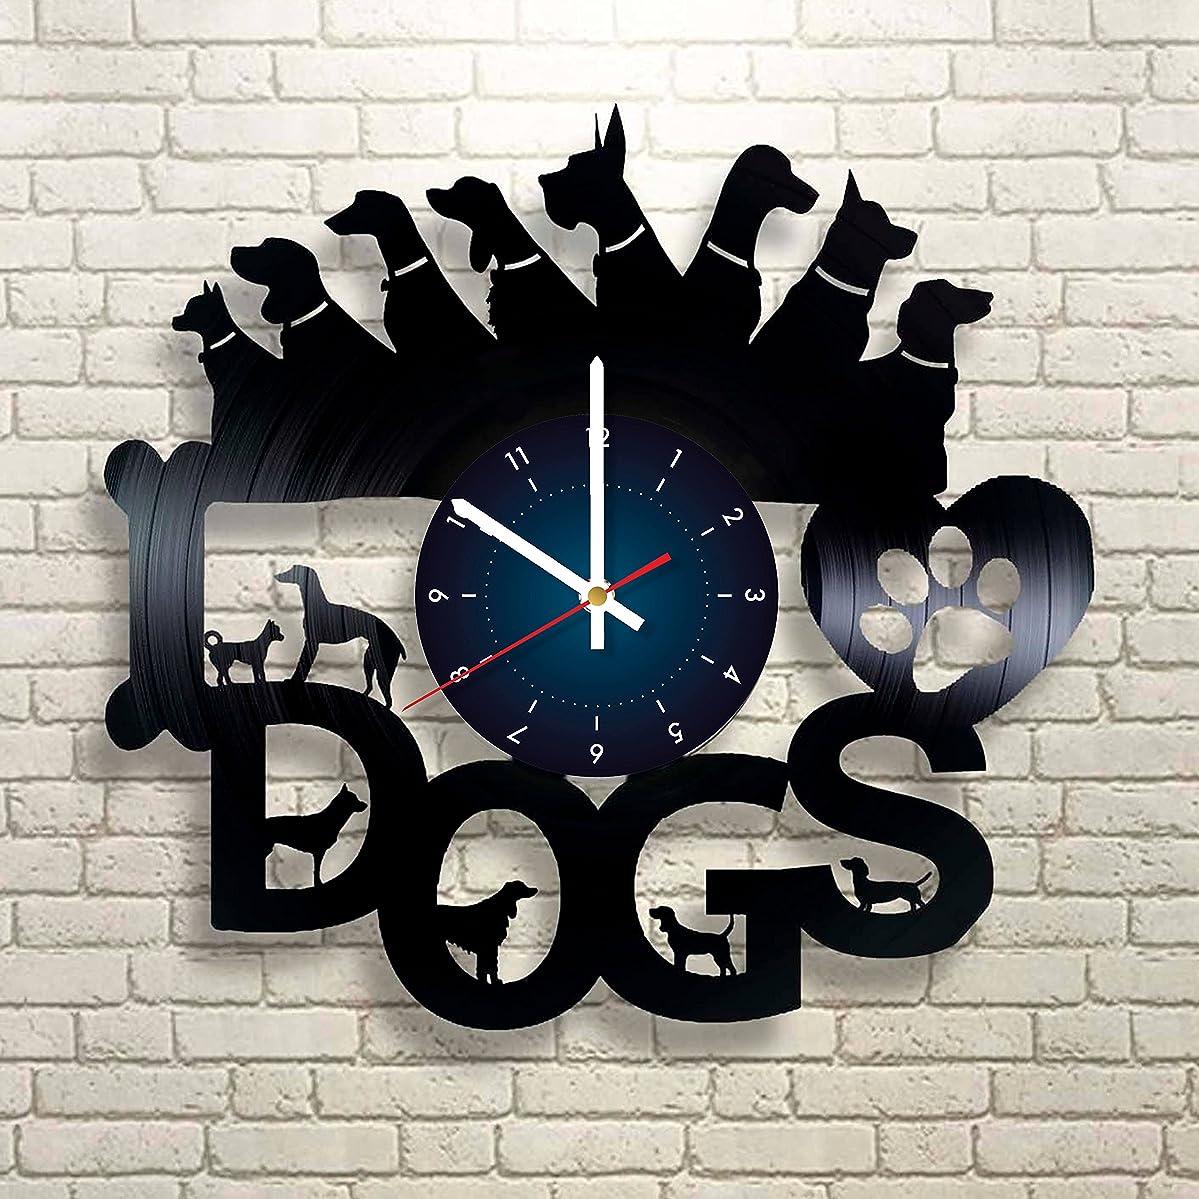 DOGS Vinyl Record Wall Clock - Kids Room wall decor - Gift ideas for kids, girls, boys, teens - Cartoon Unique Art Design